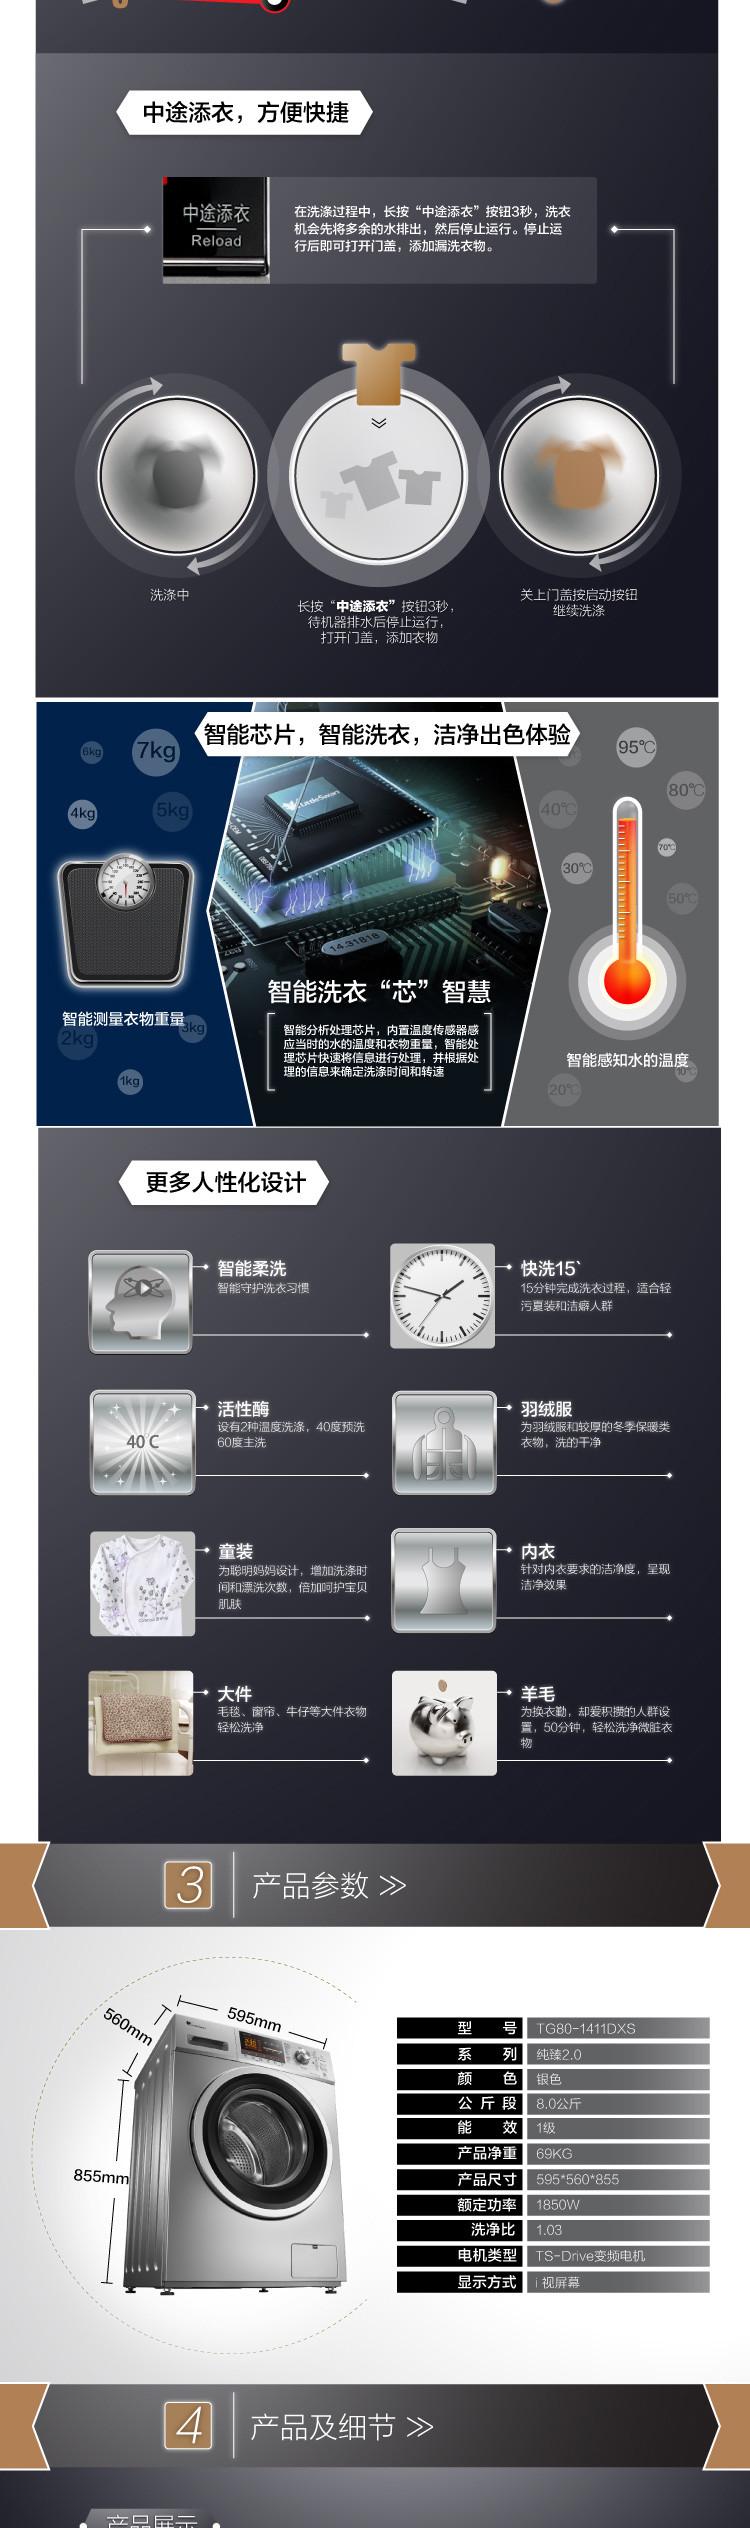 小天鹅洗衣机tg80-1411dxs